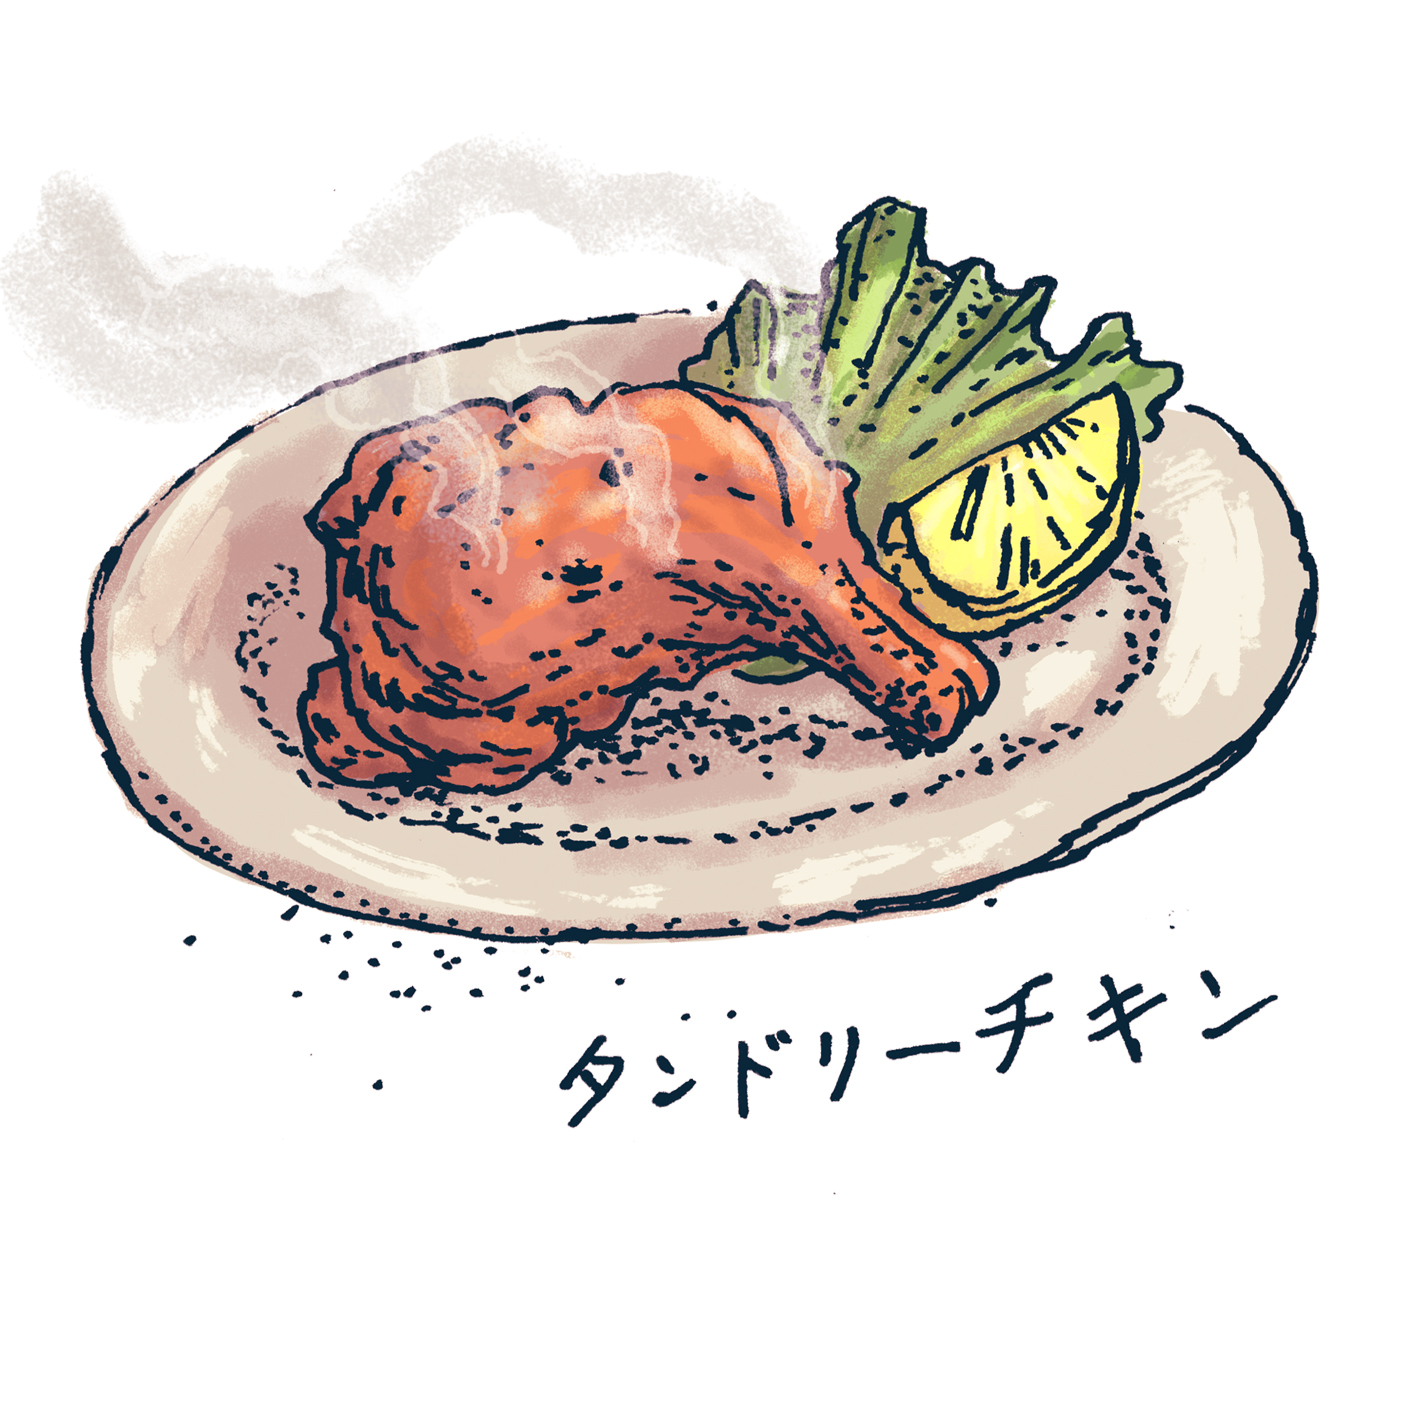 tarzan_food_2.jpg